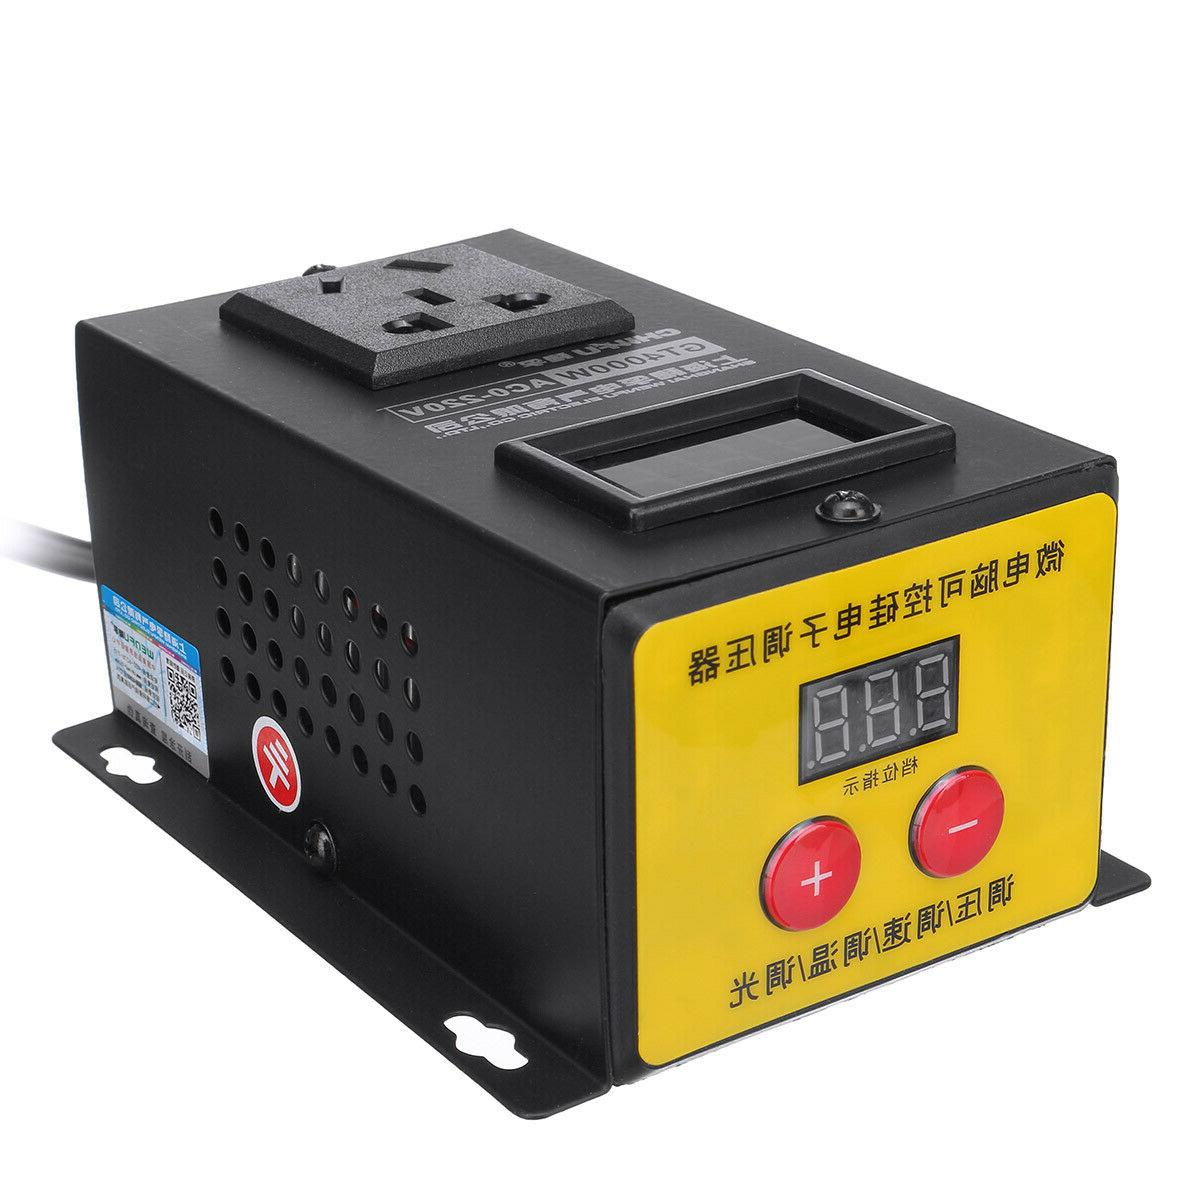 ac 220v 4000w variable voltage regulator power